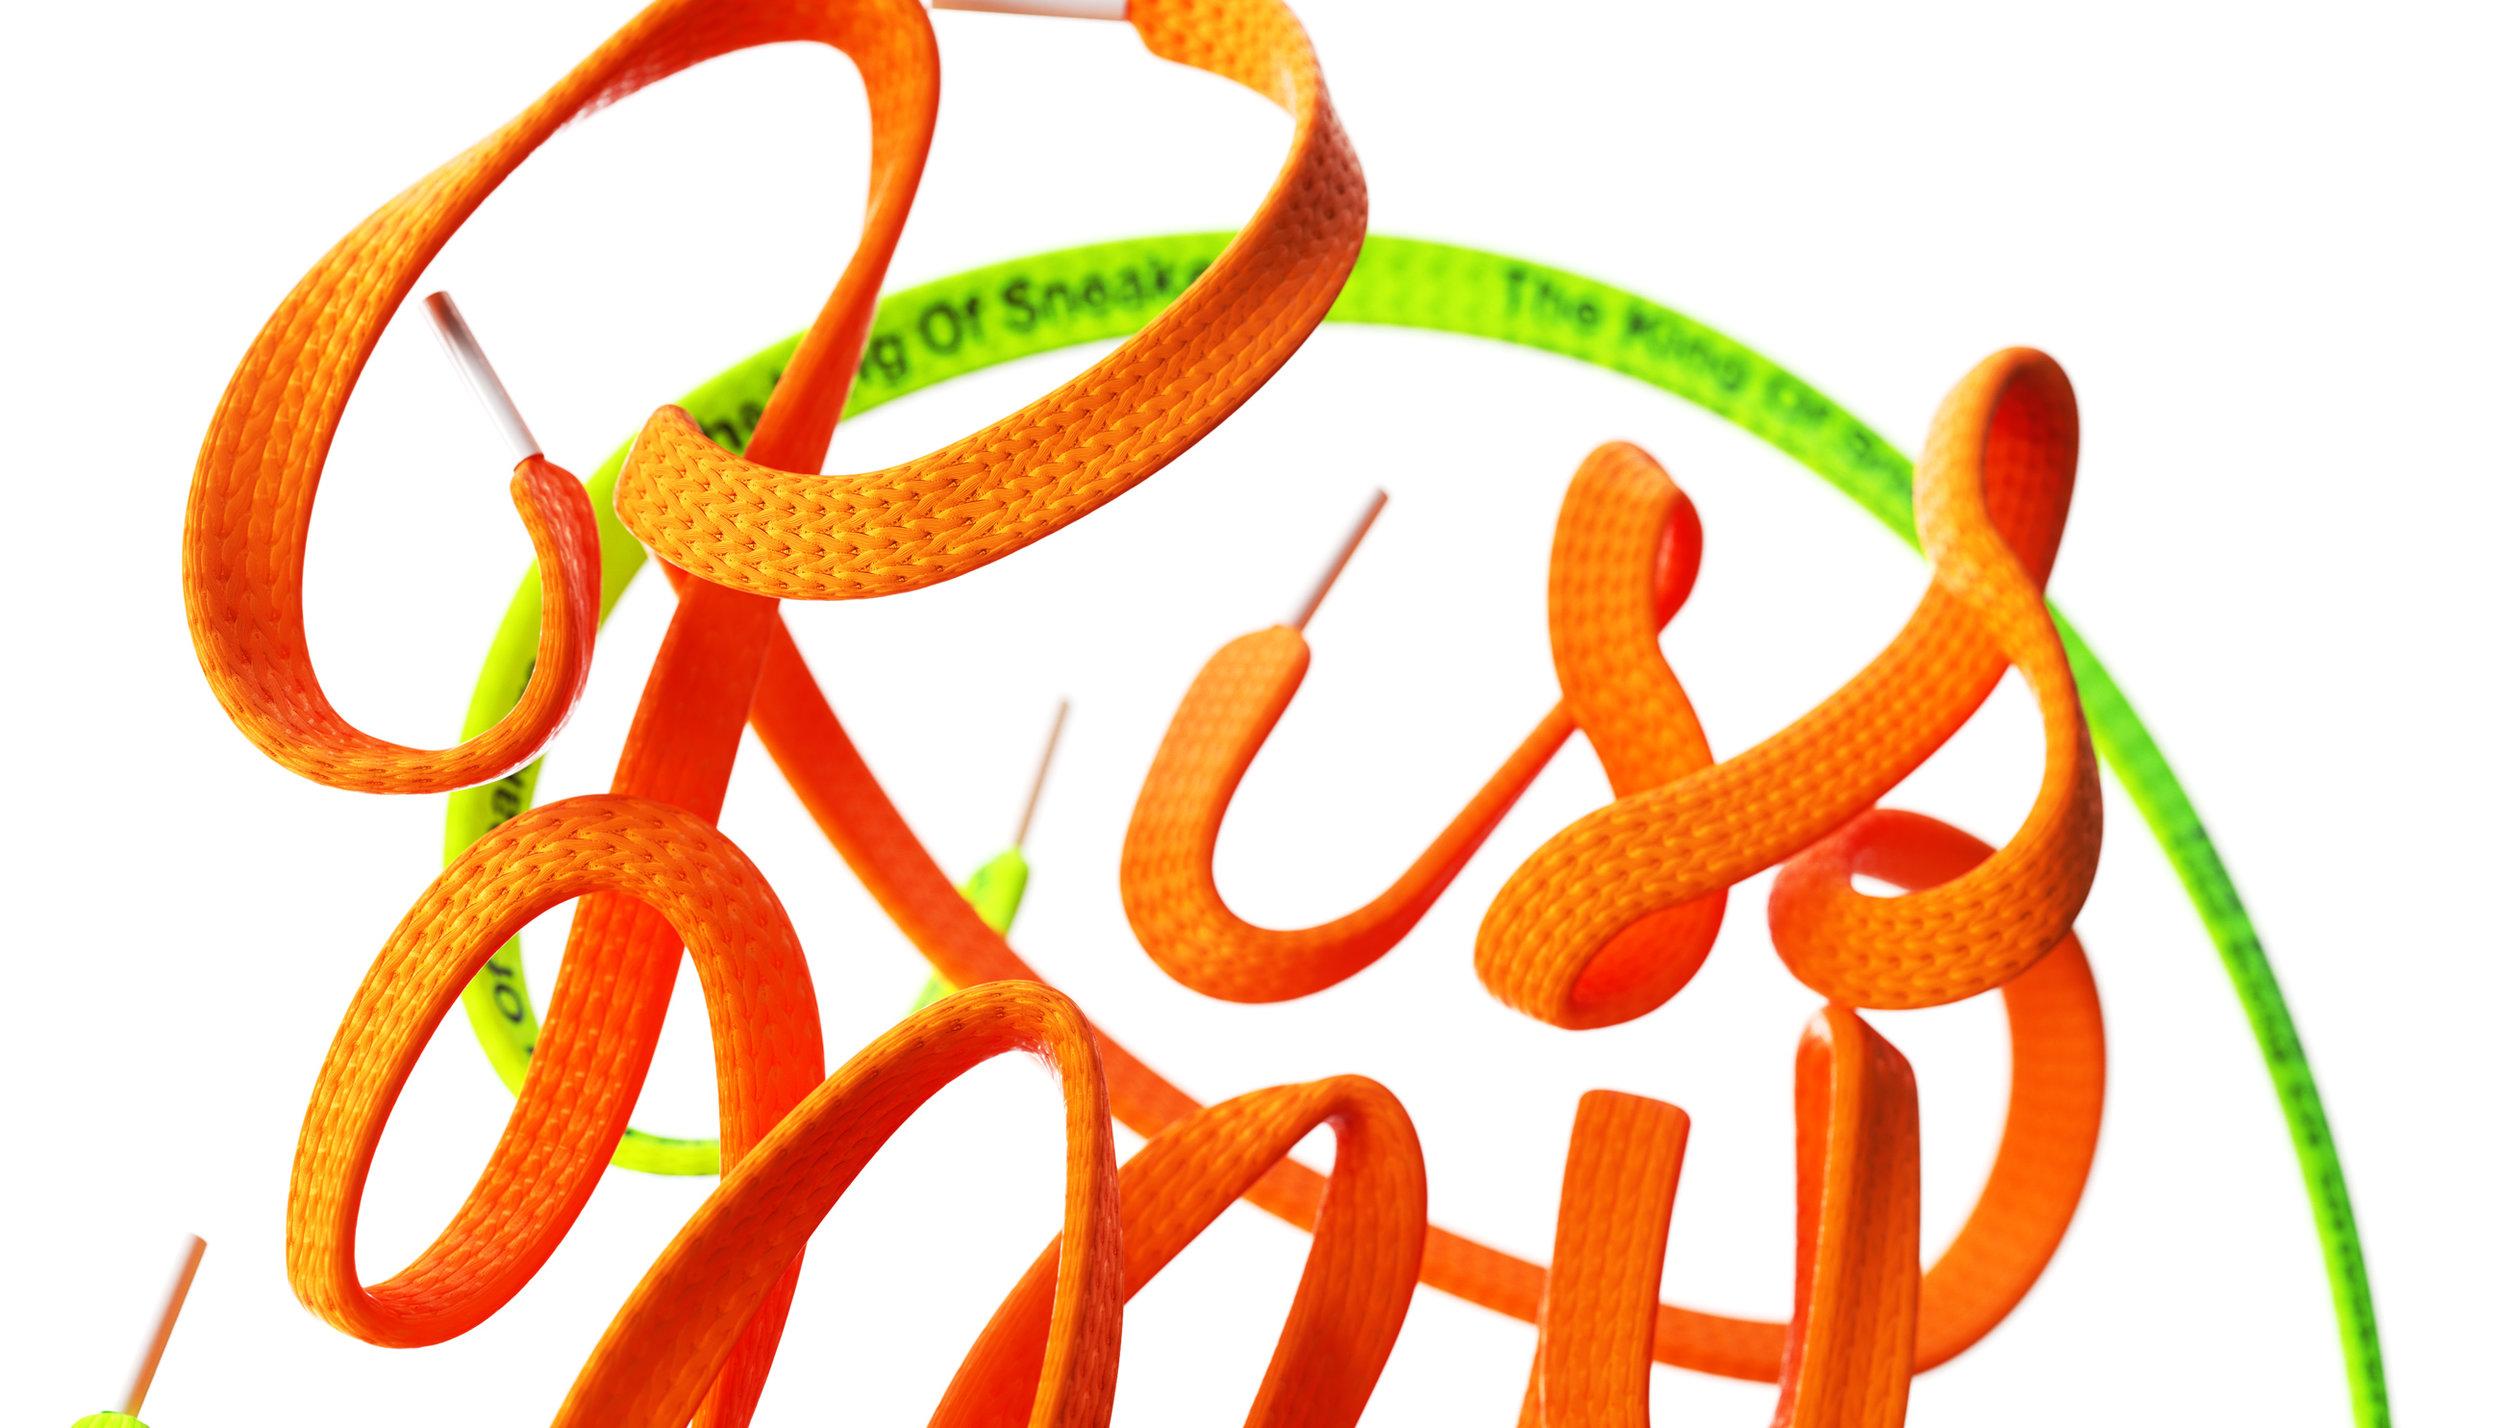 KissMyKicks-3DTypography_ShoeLace_OrangeGreen_BenFearnley-DOF_Landscape.jpg